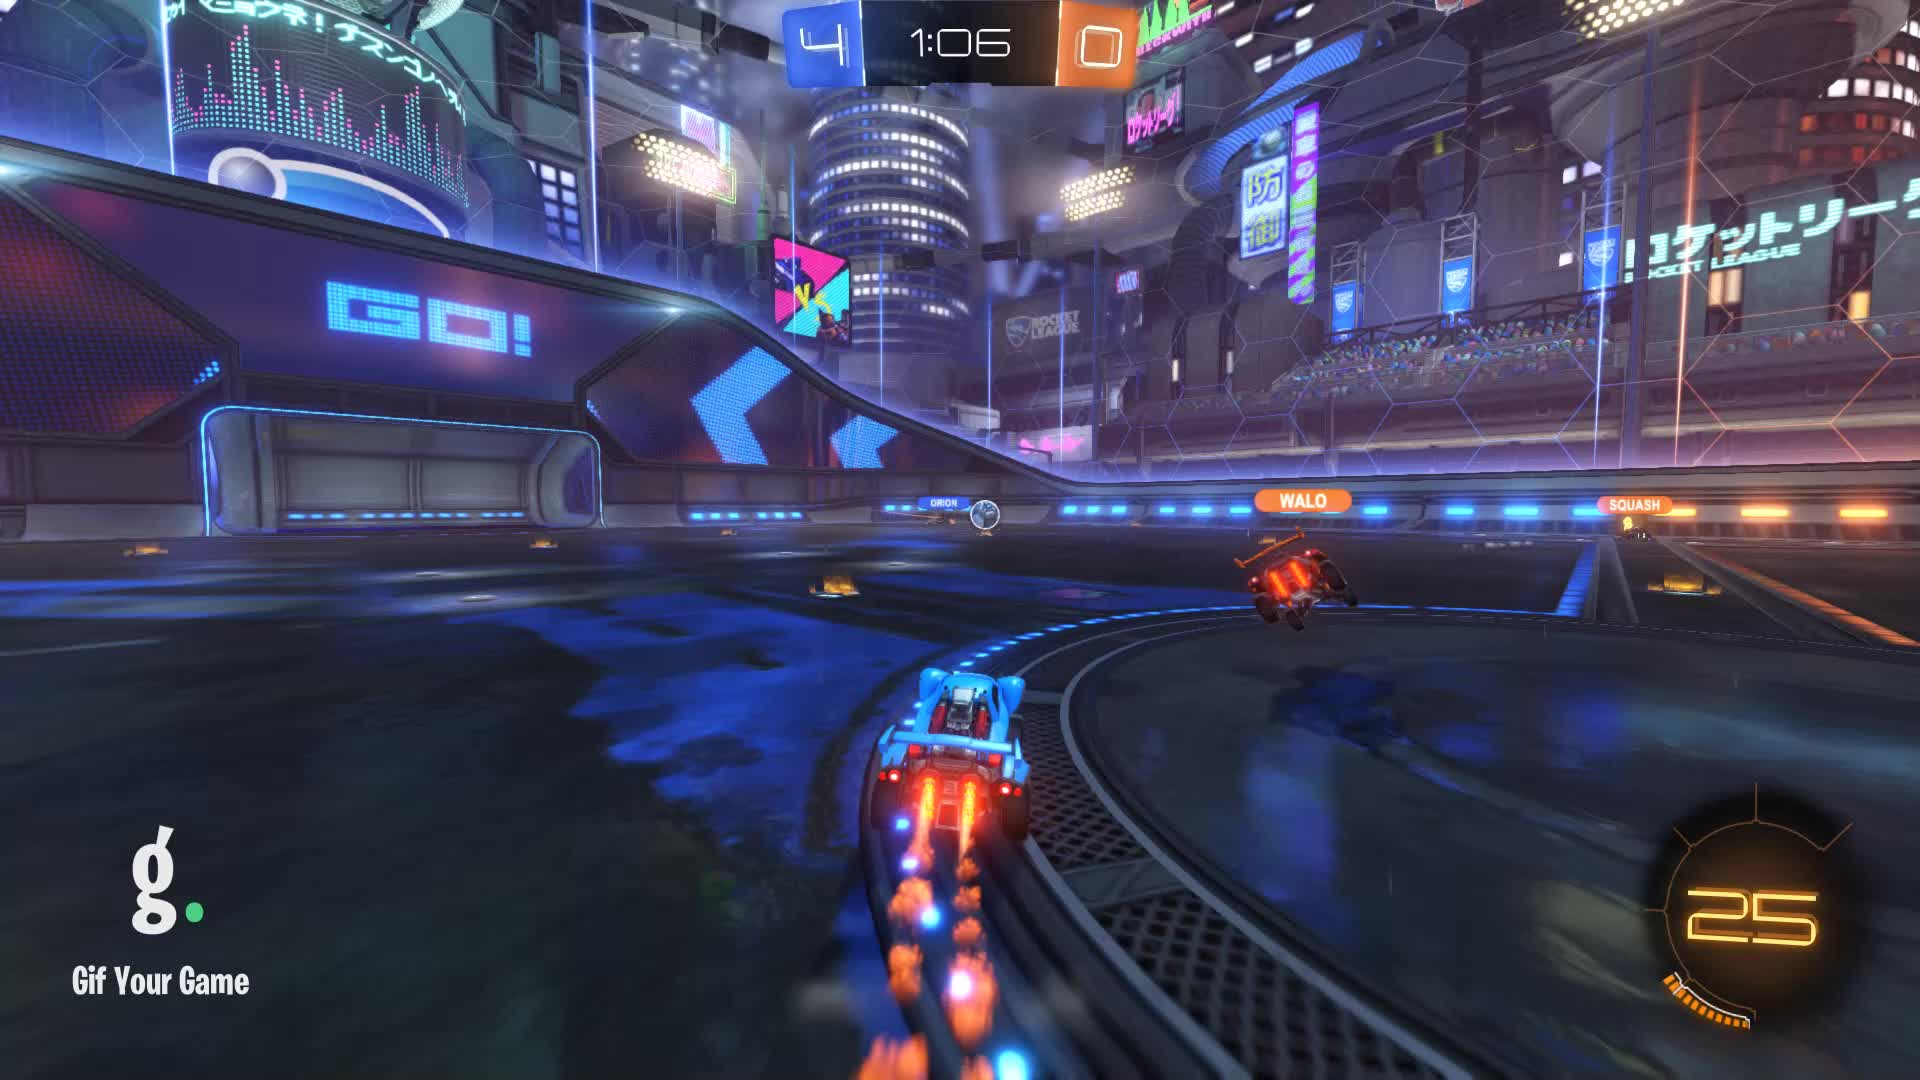 Gif Your Game, GifYourGame, Goal, HONORIS, Rocket League, RocketLeague, Goal 5: Squash GIFs